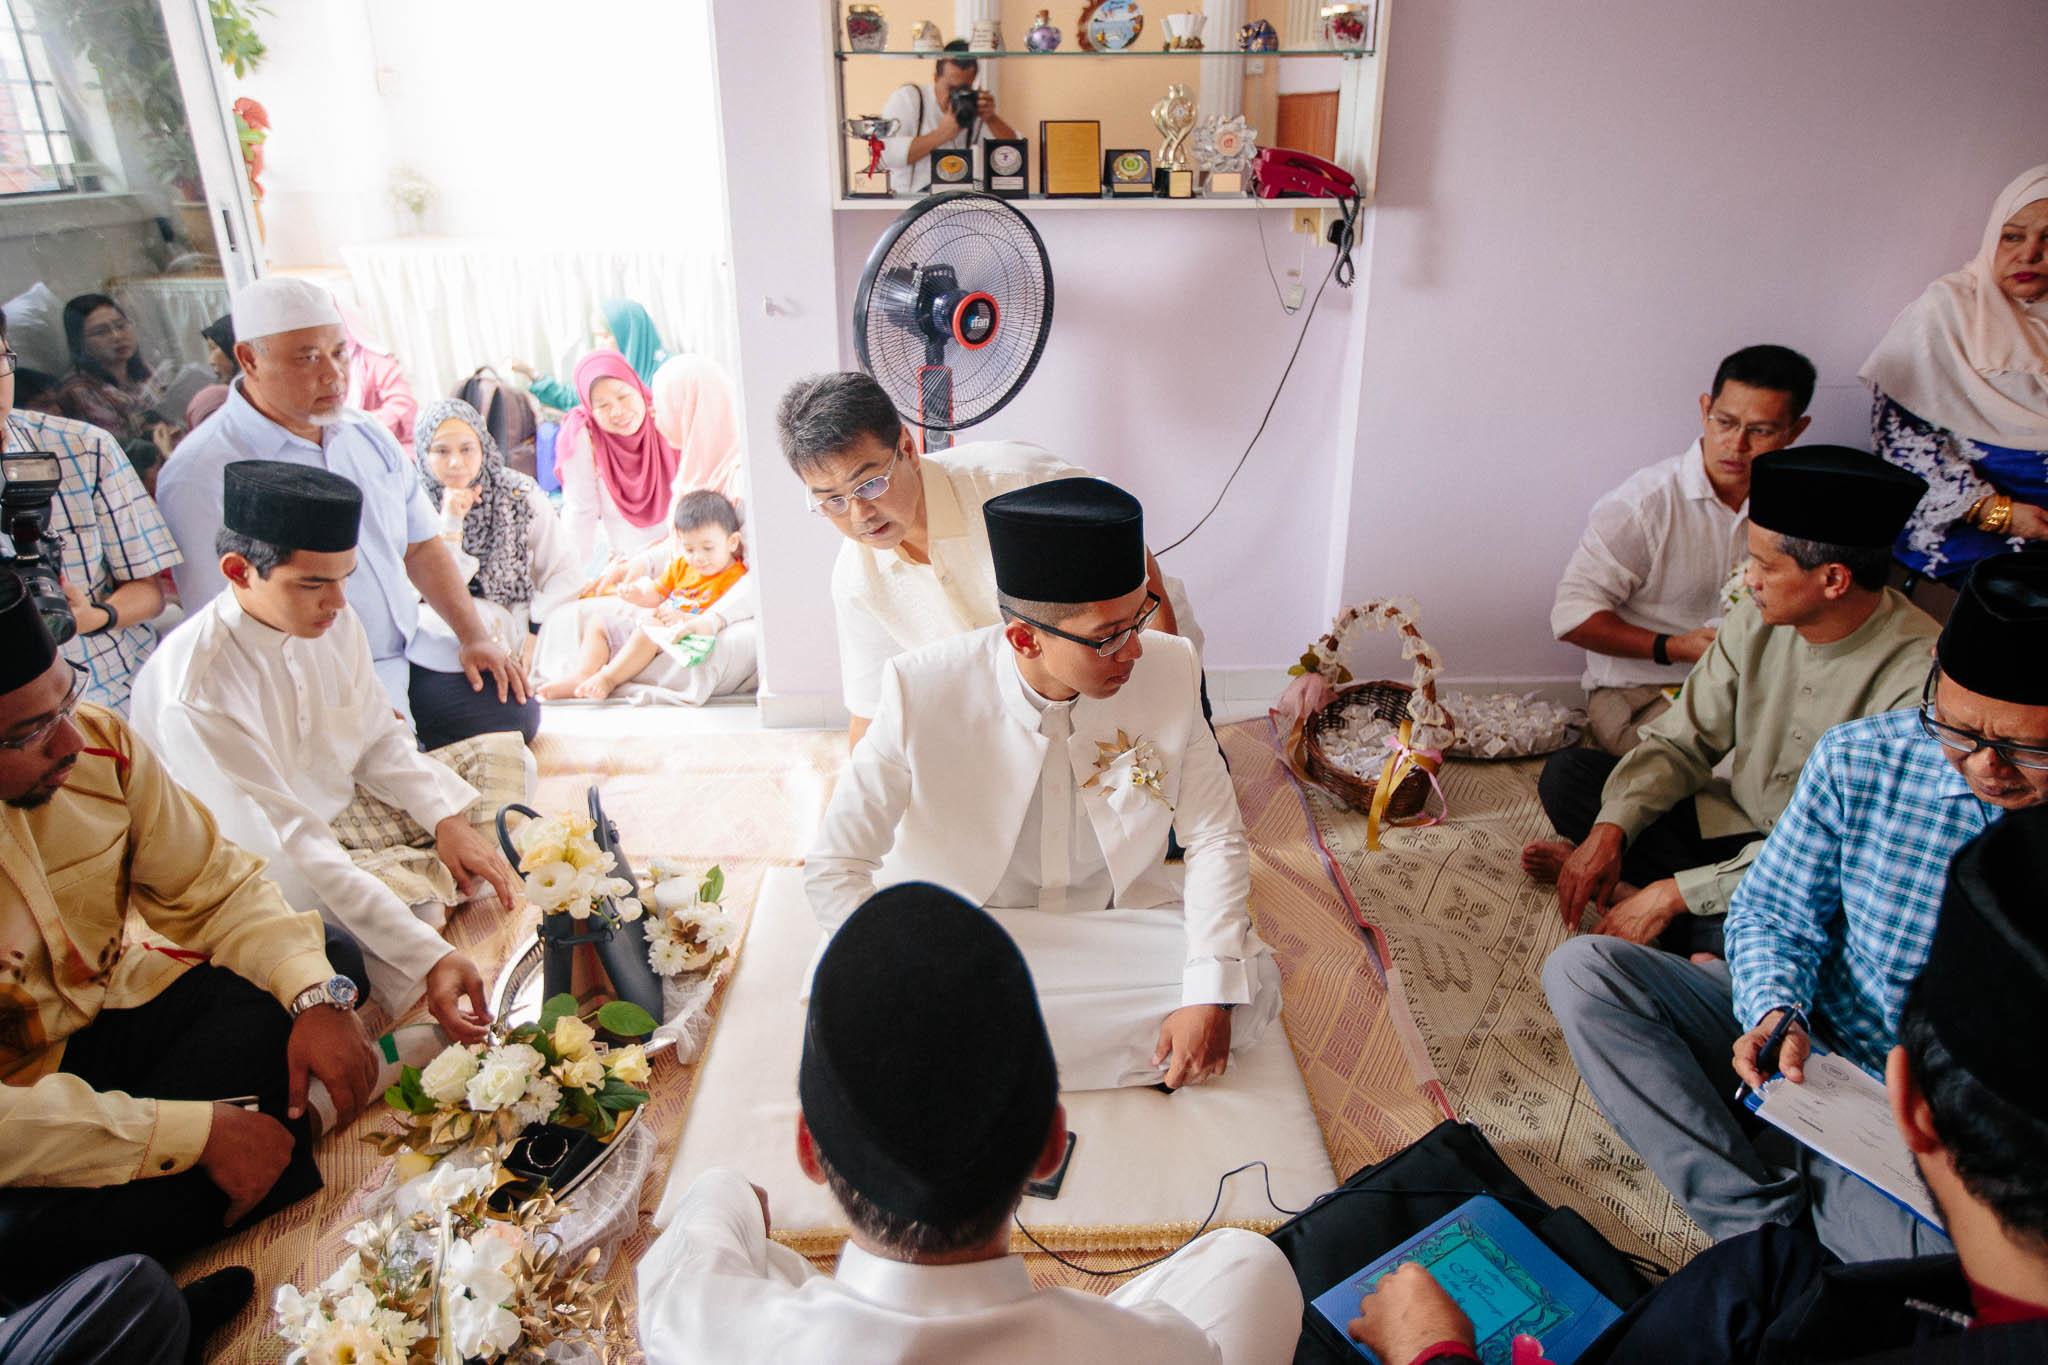 singapore-wedding-photographer-sharalyn-syazwan-018.jpg